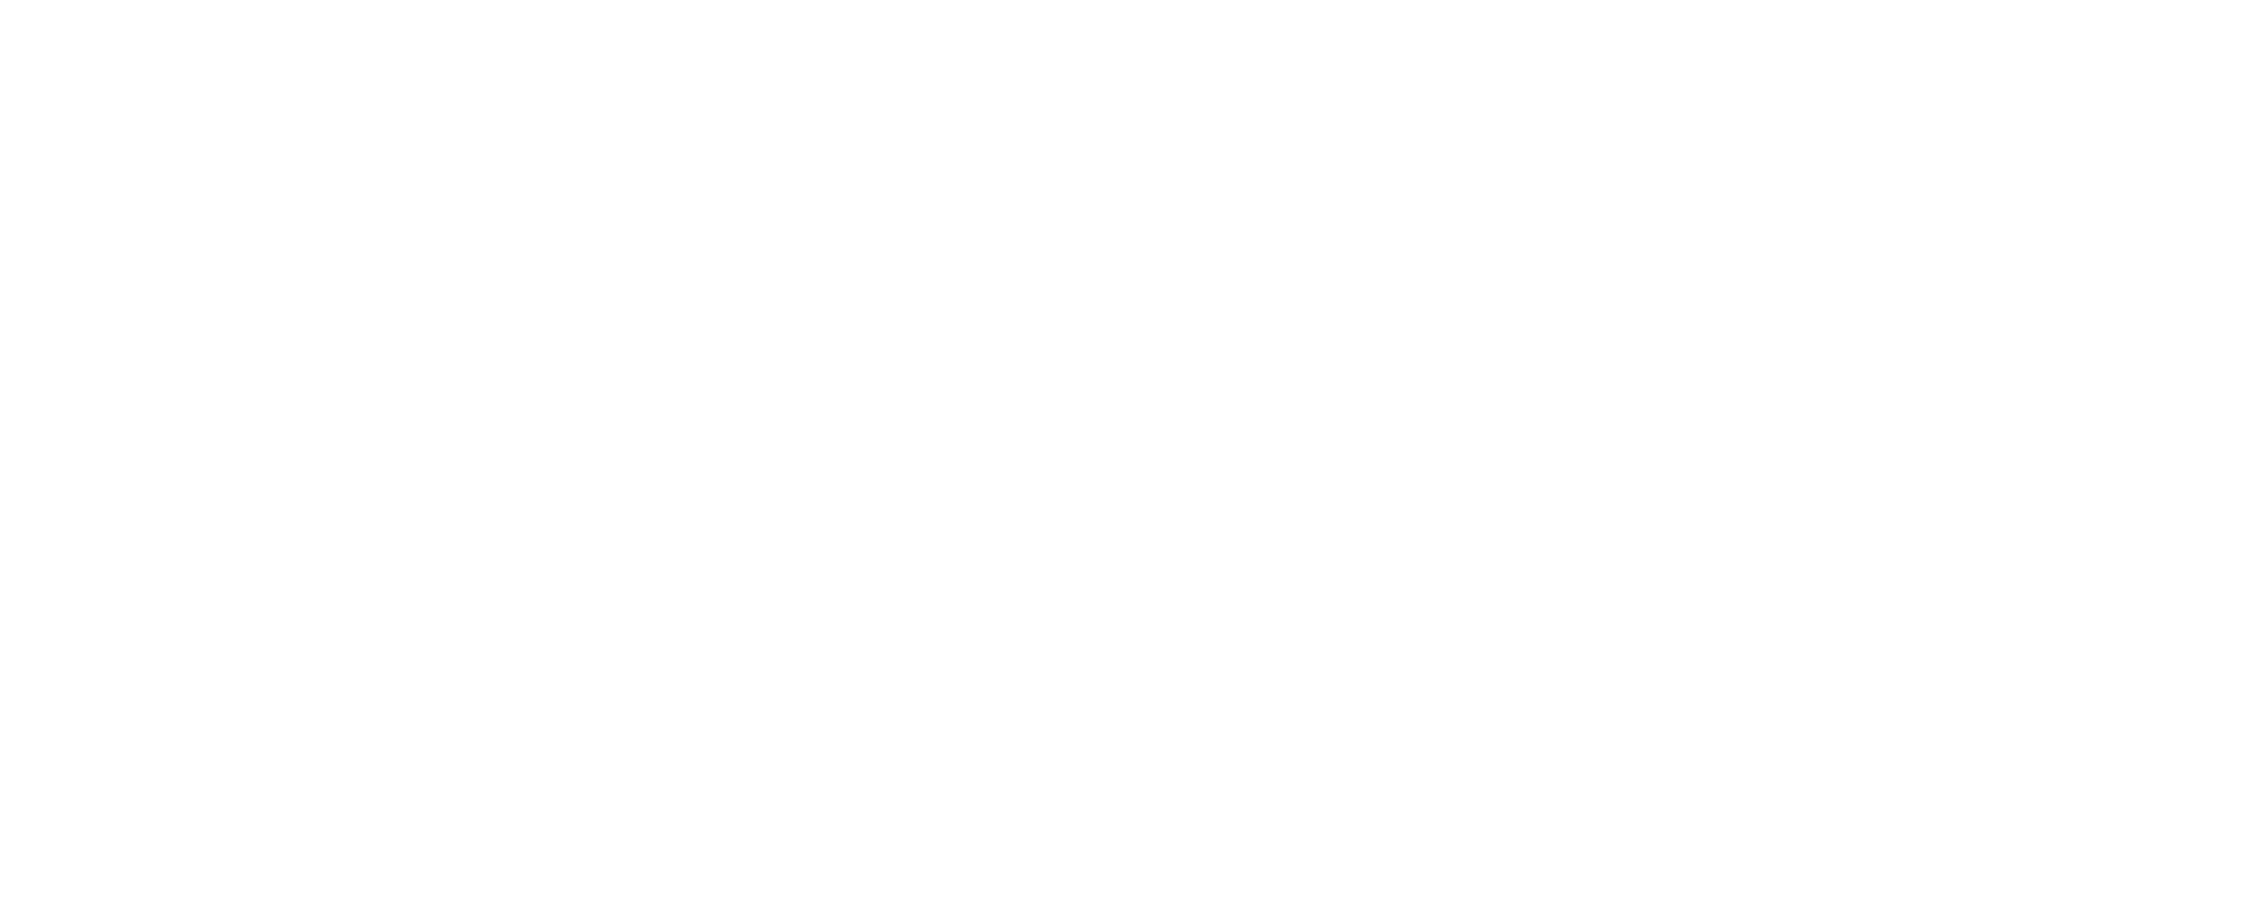 SAVON DE MARSEILLE ALOE VERA 100g